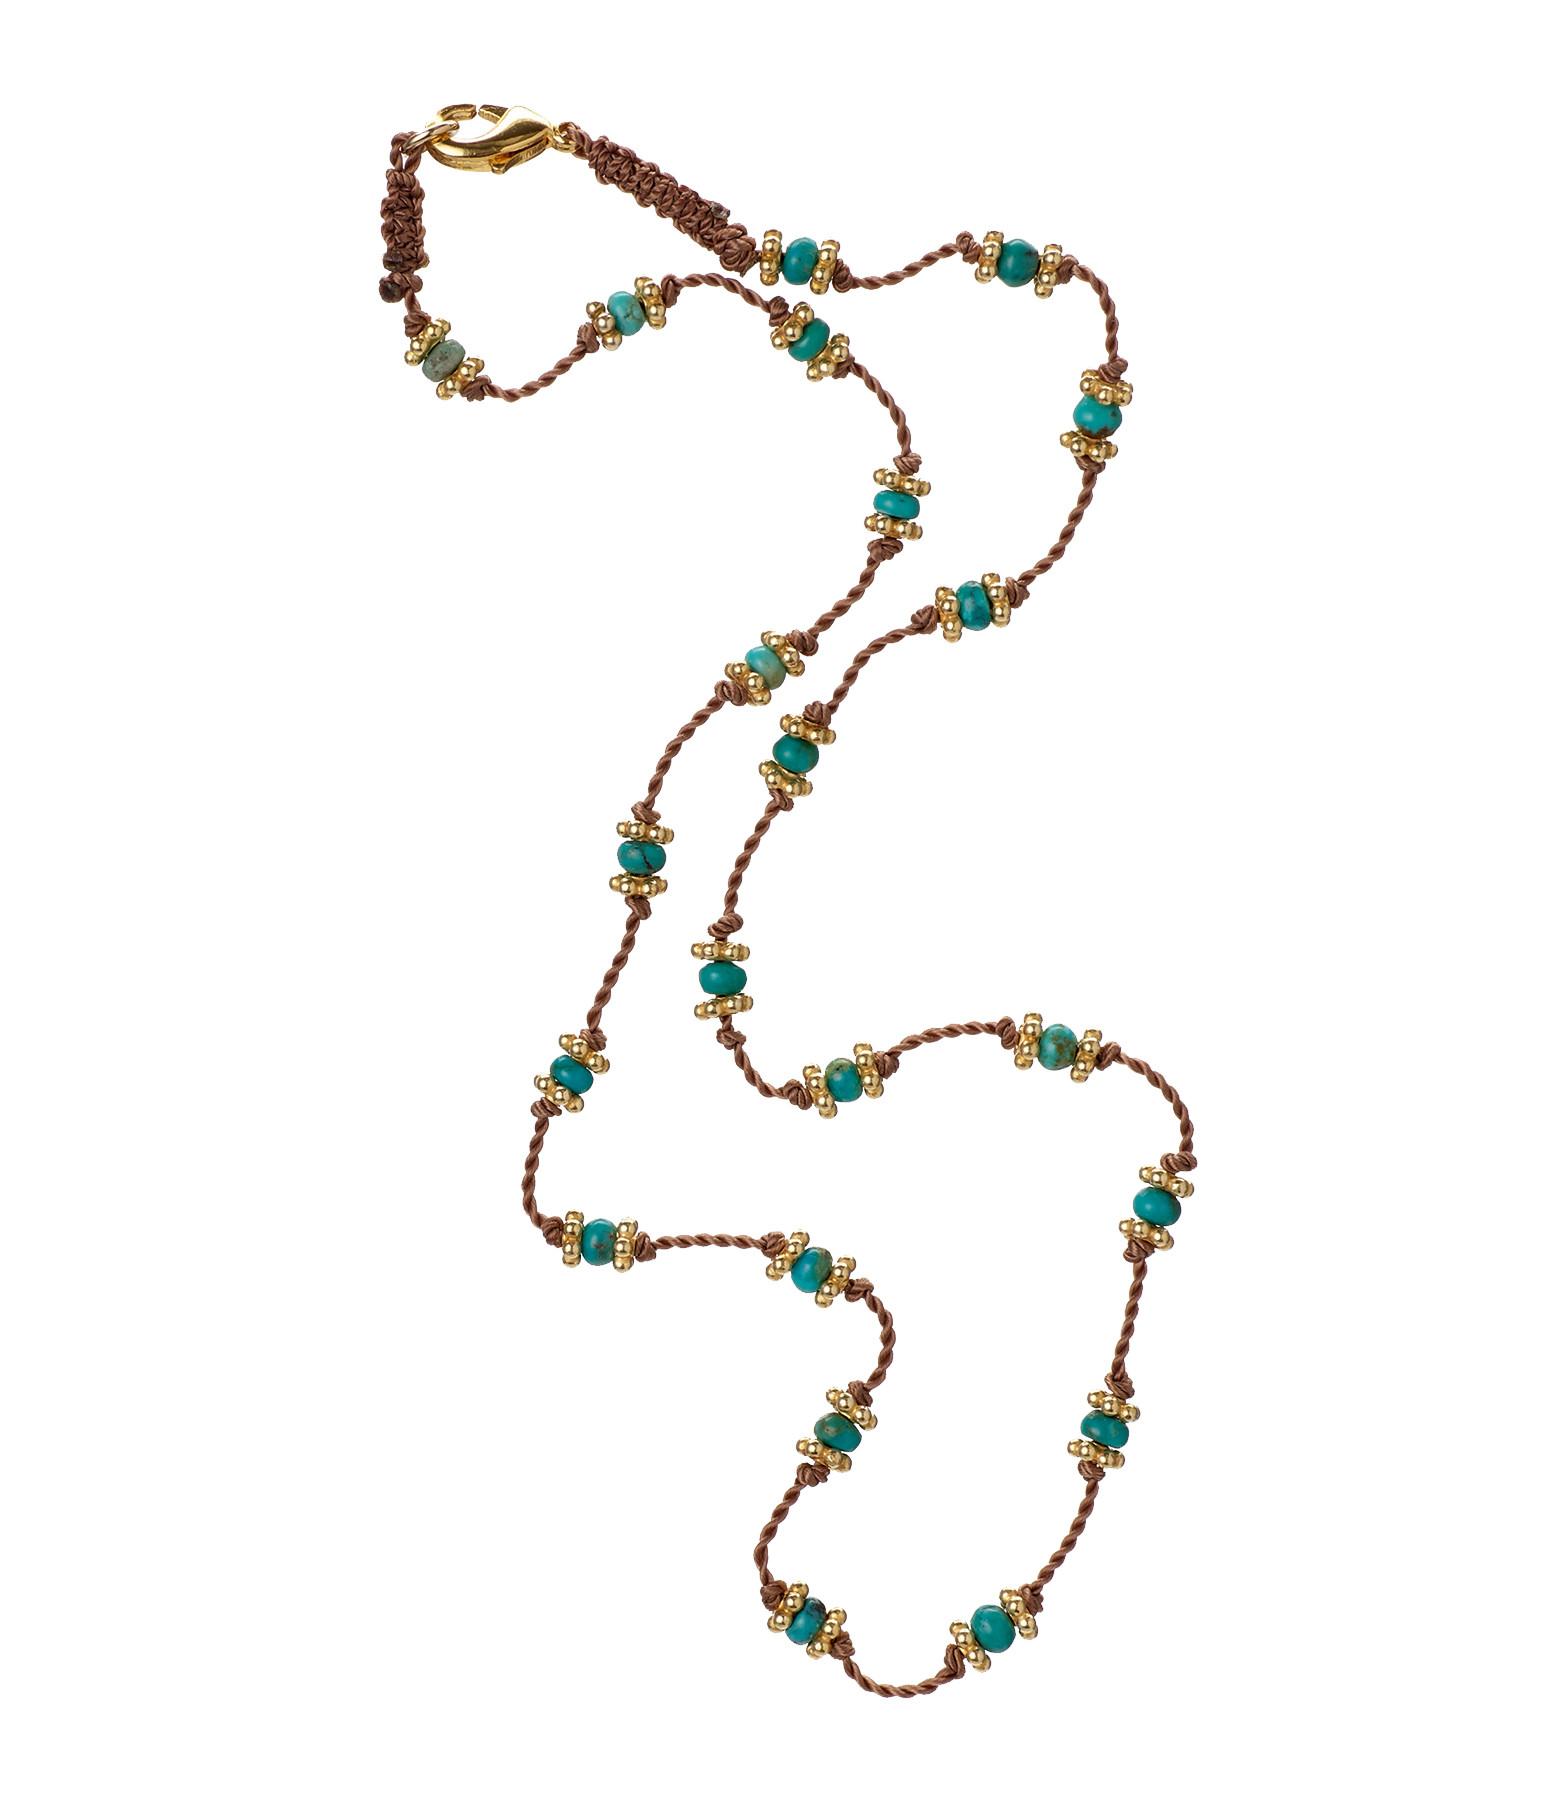 TITYARAVY - Collier Long Lotus Beige Turquoise Plaqué Or